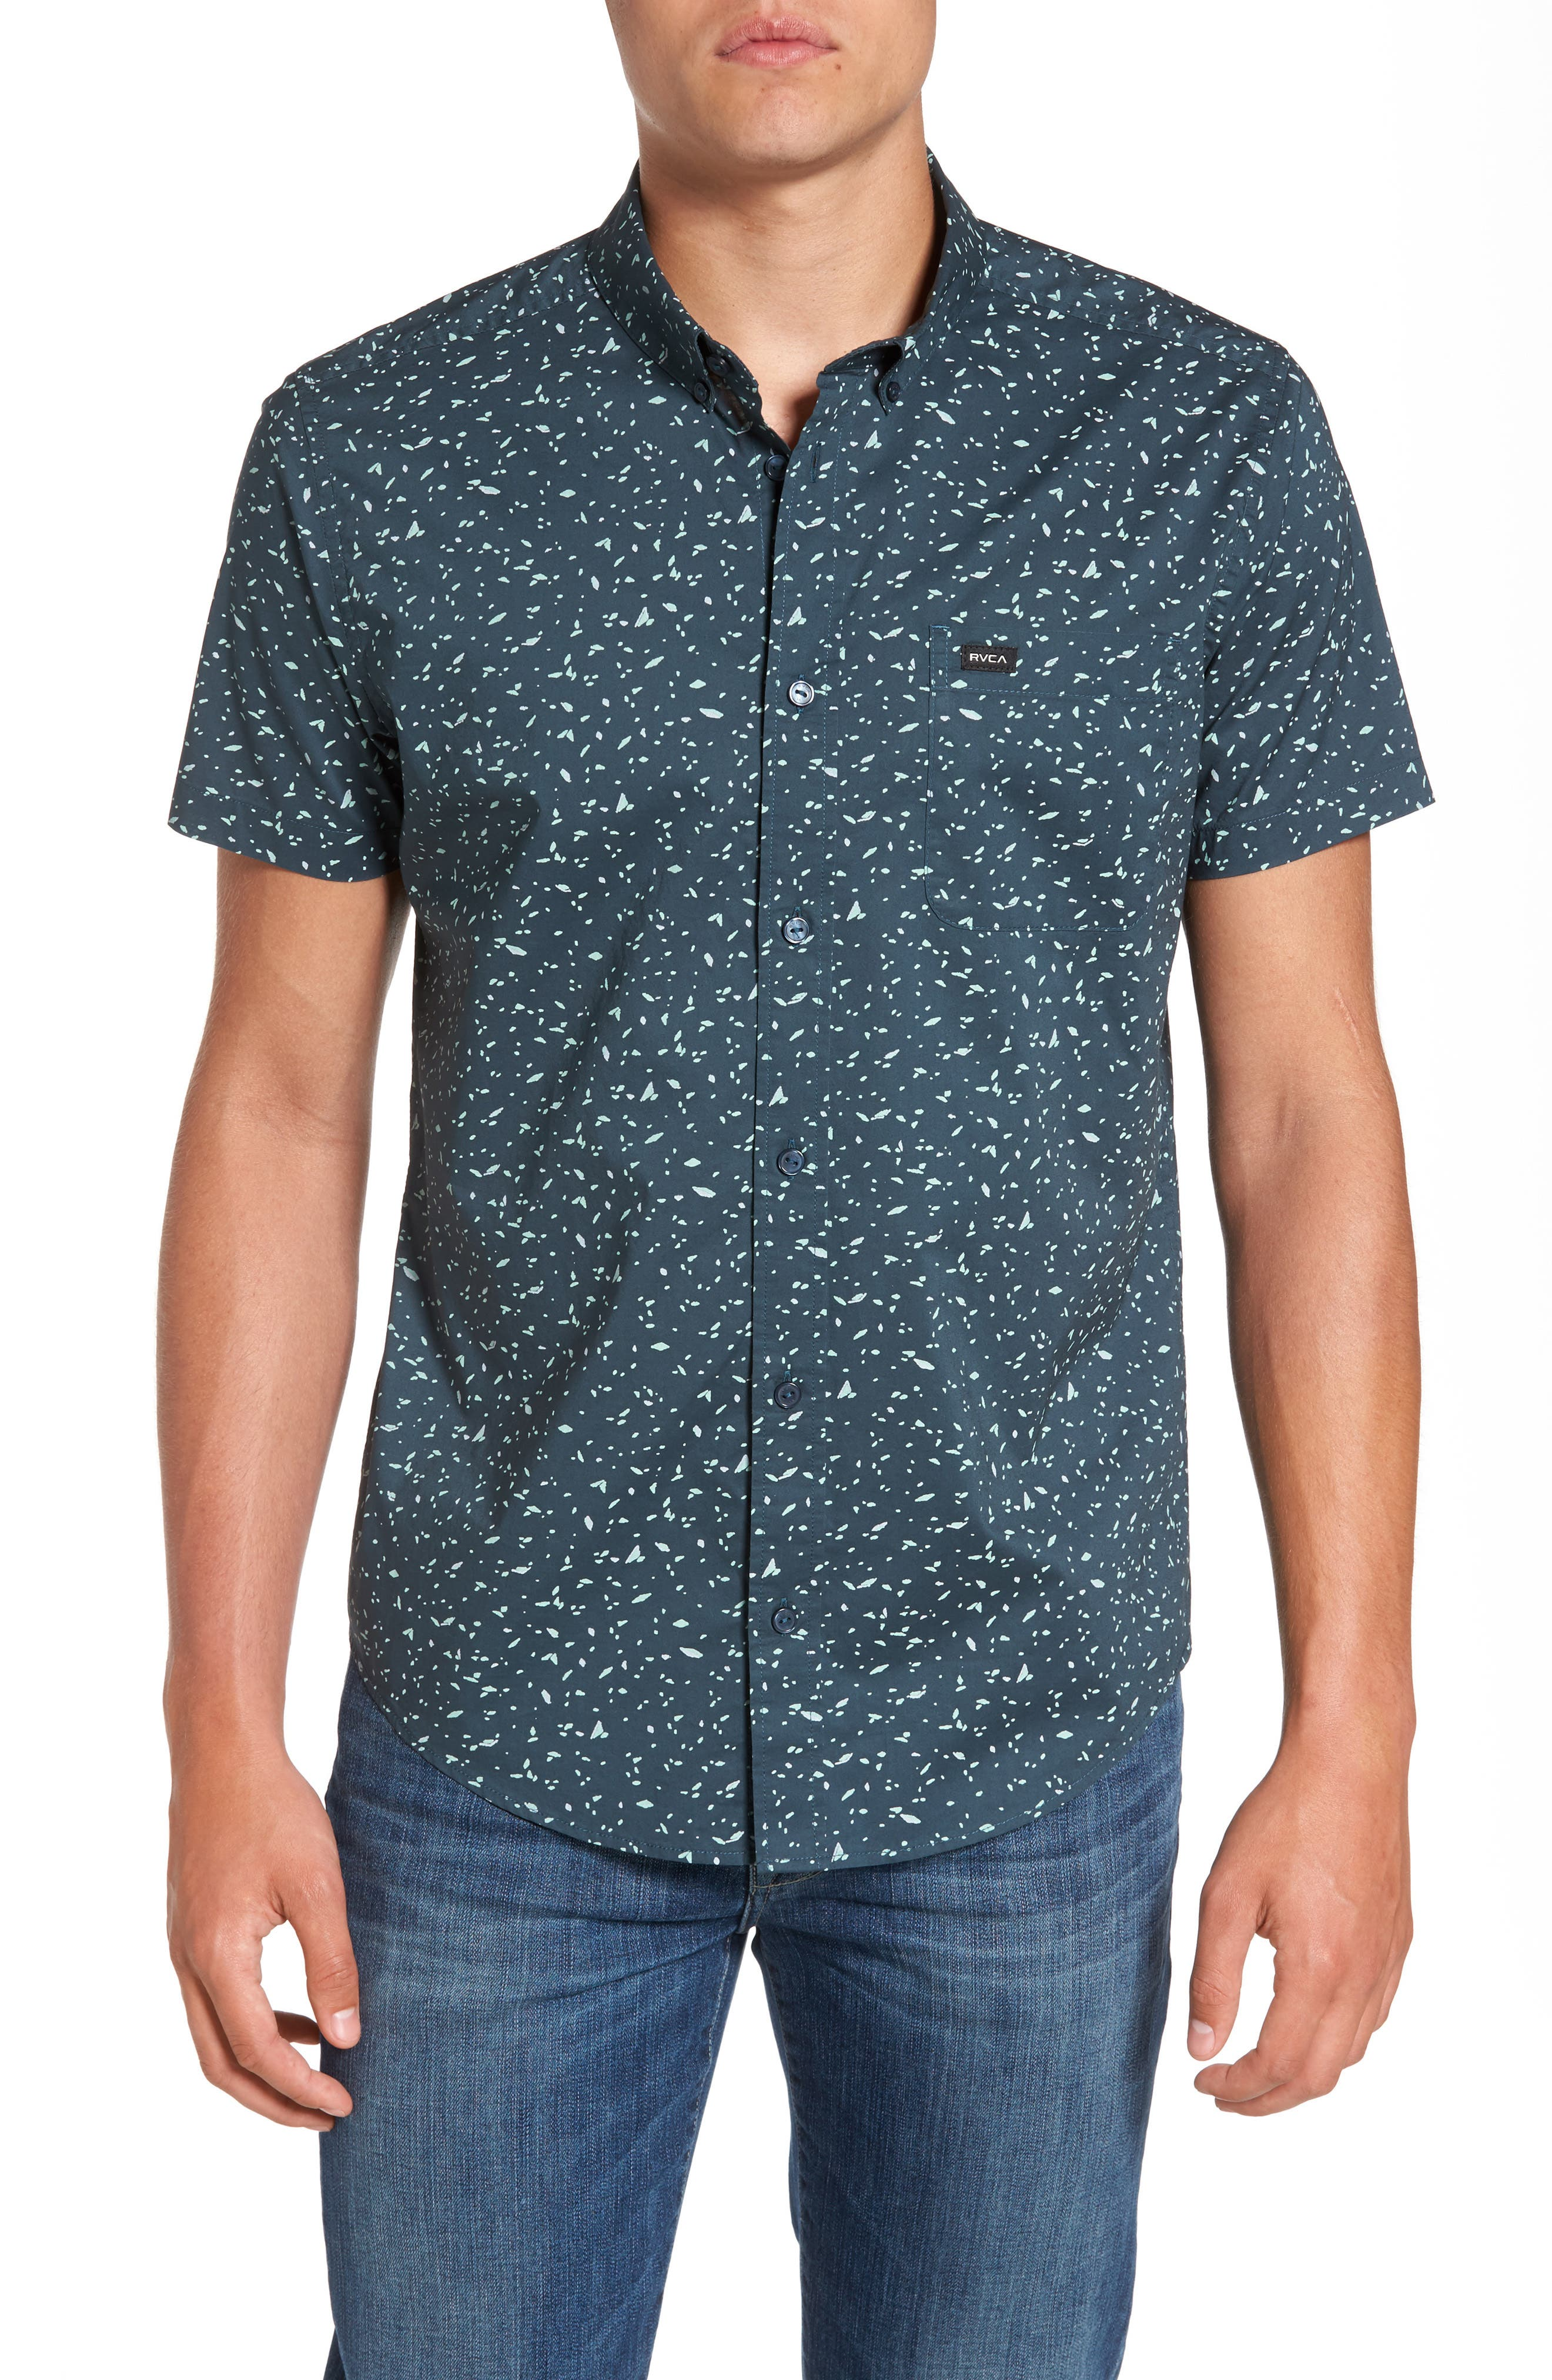 RVCA Galaxy Spatter-Print Woven Shirt